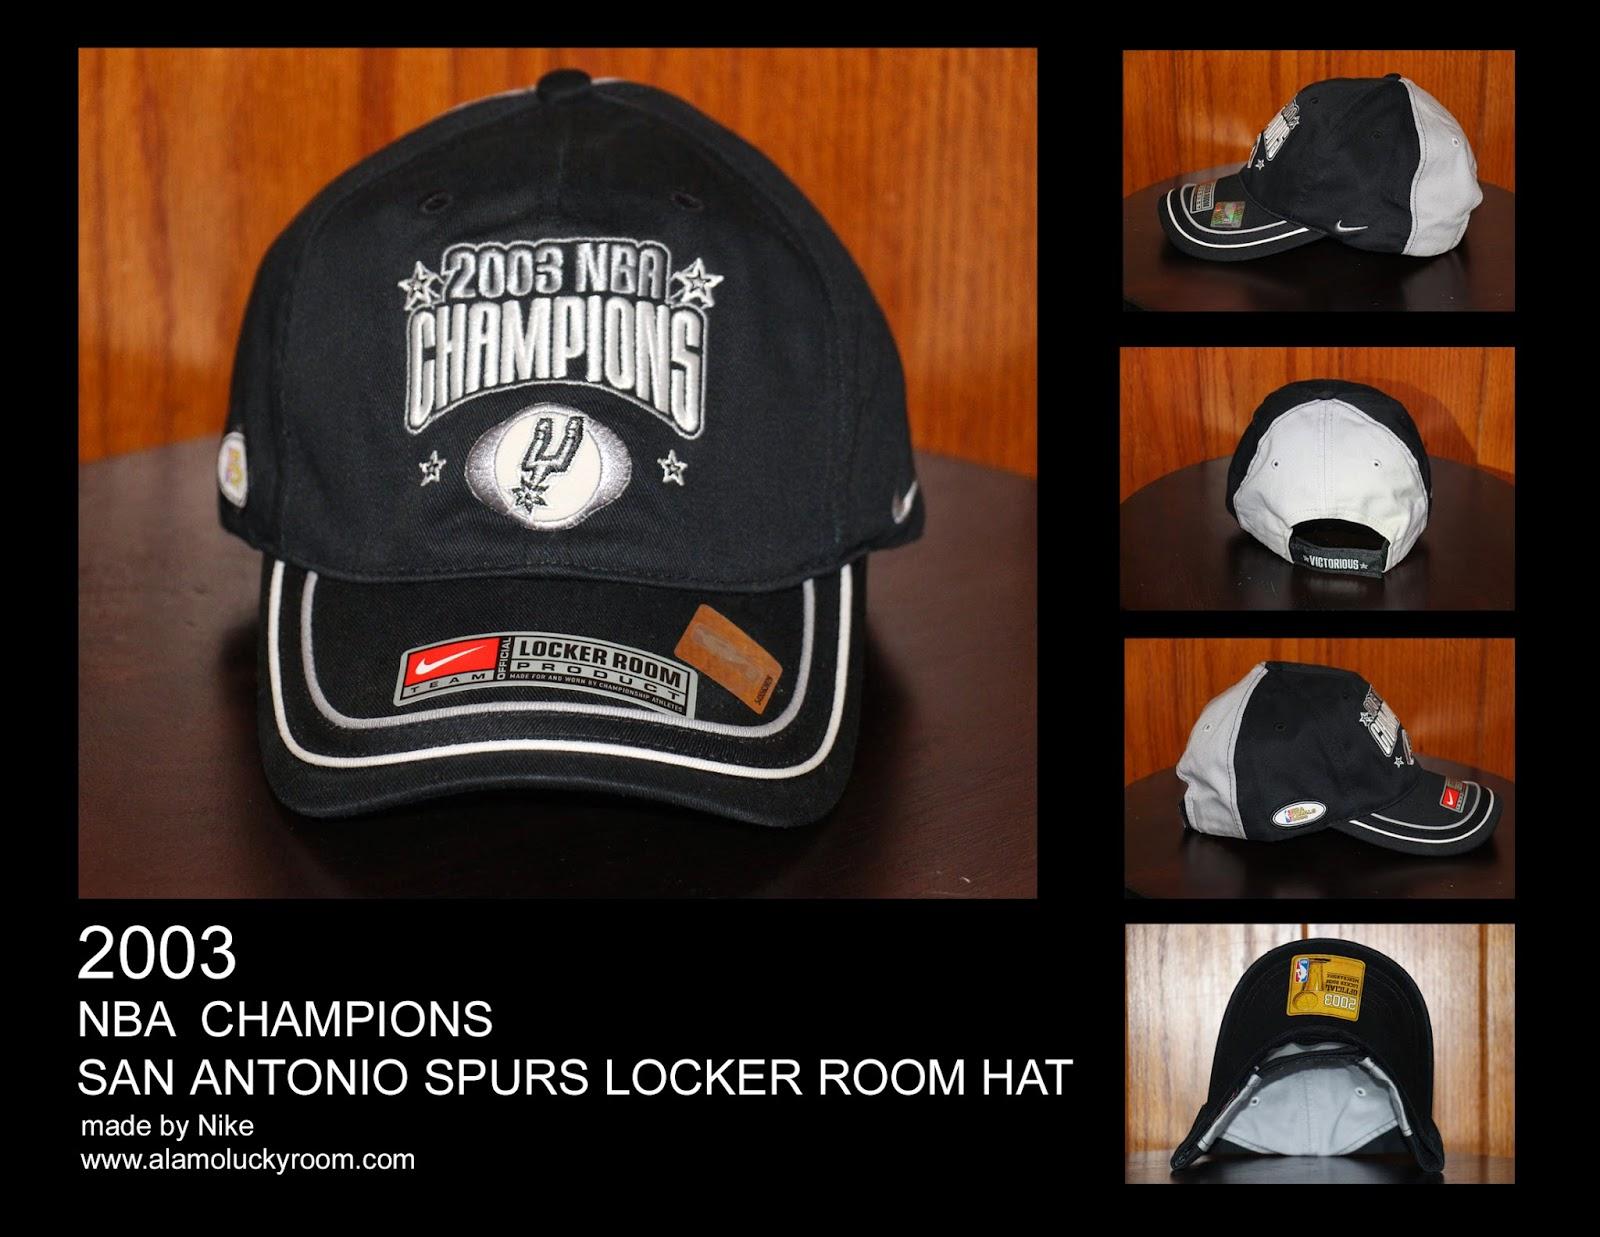 Alamo Lucky Room: 2003 San Antonio Spurs NBA Champions Locker Room Hat